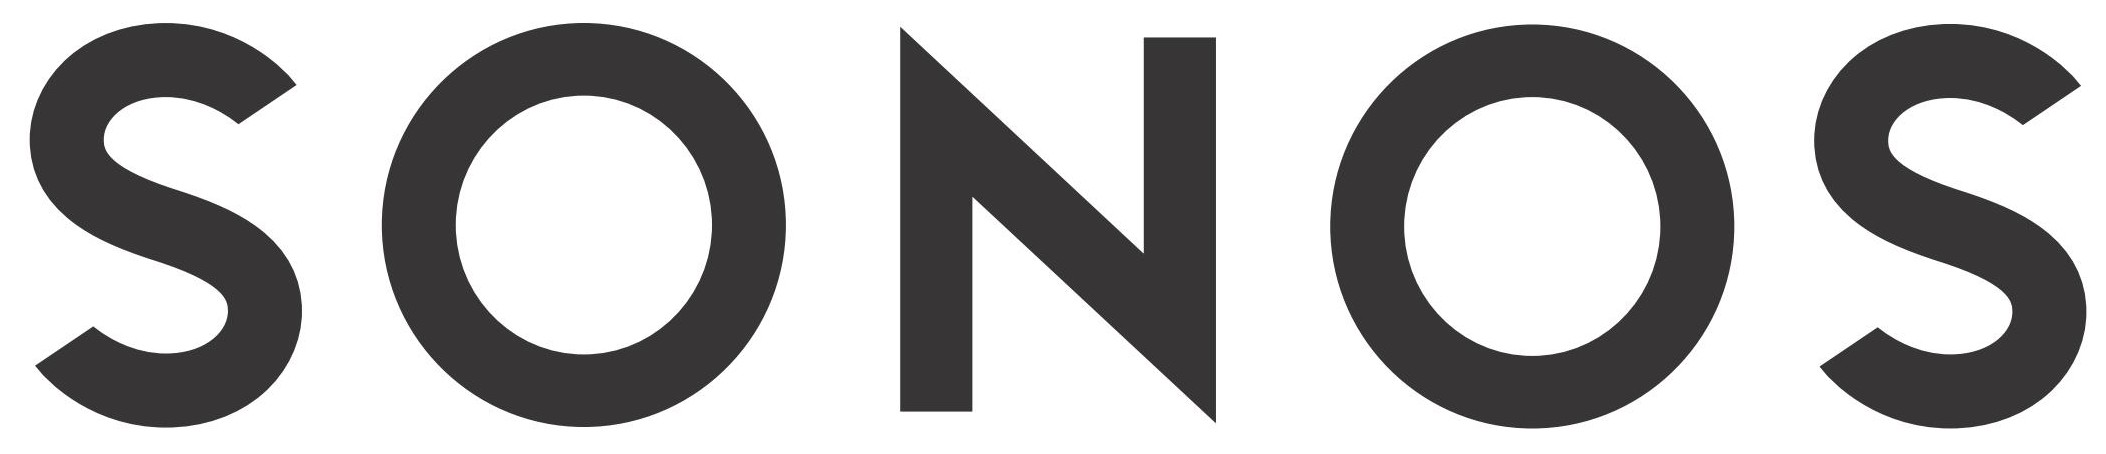 Sonos Logo png